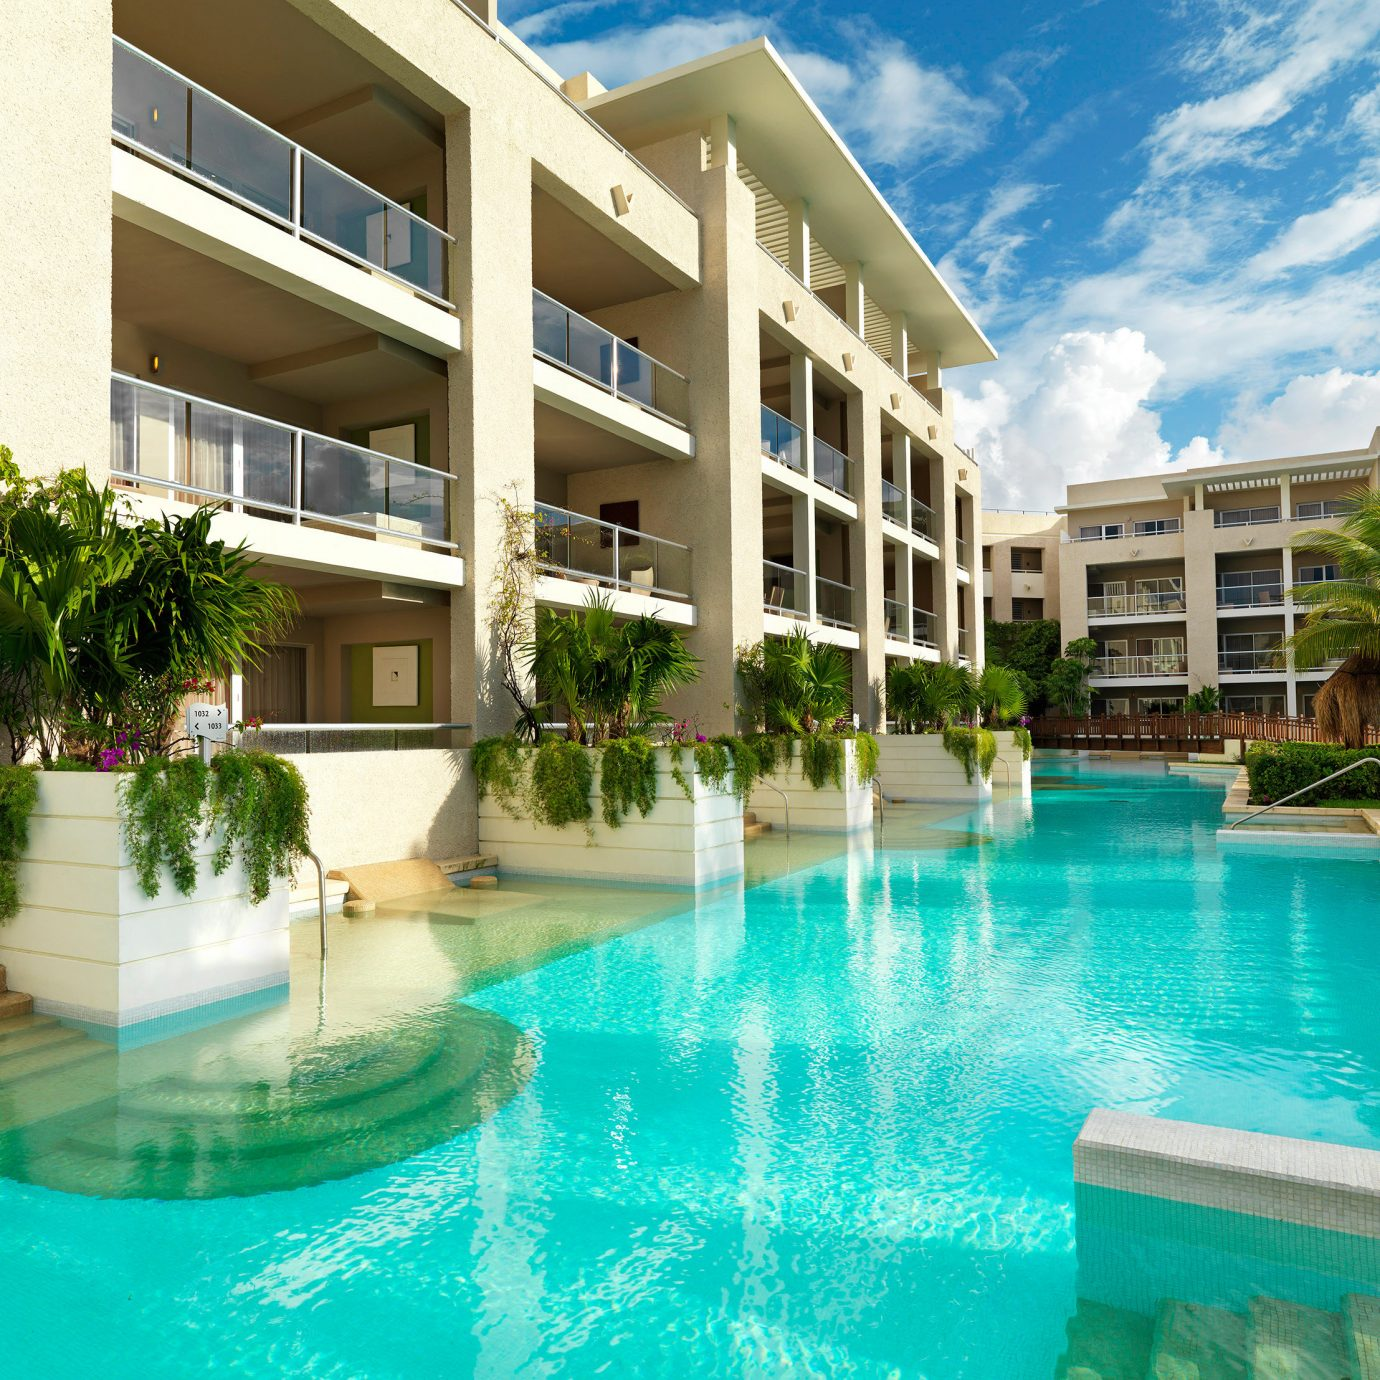 Hotels building condominium swimming pool Resort property leisure Pool leisure centre home blue resort town Villa mansion swimming